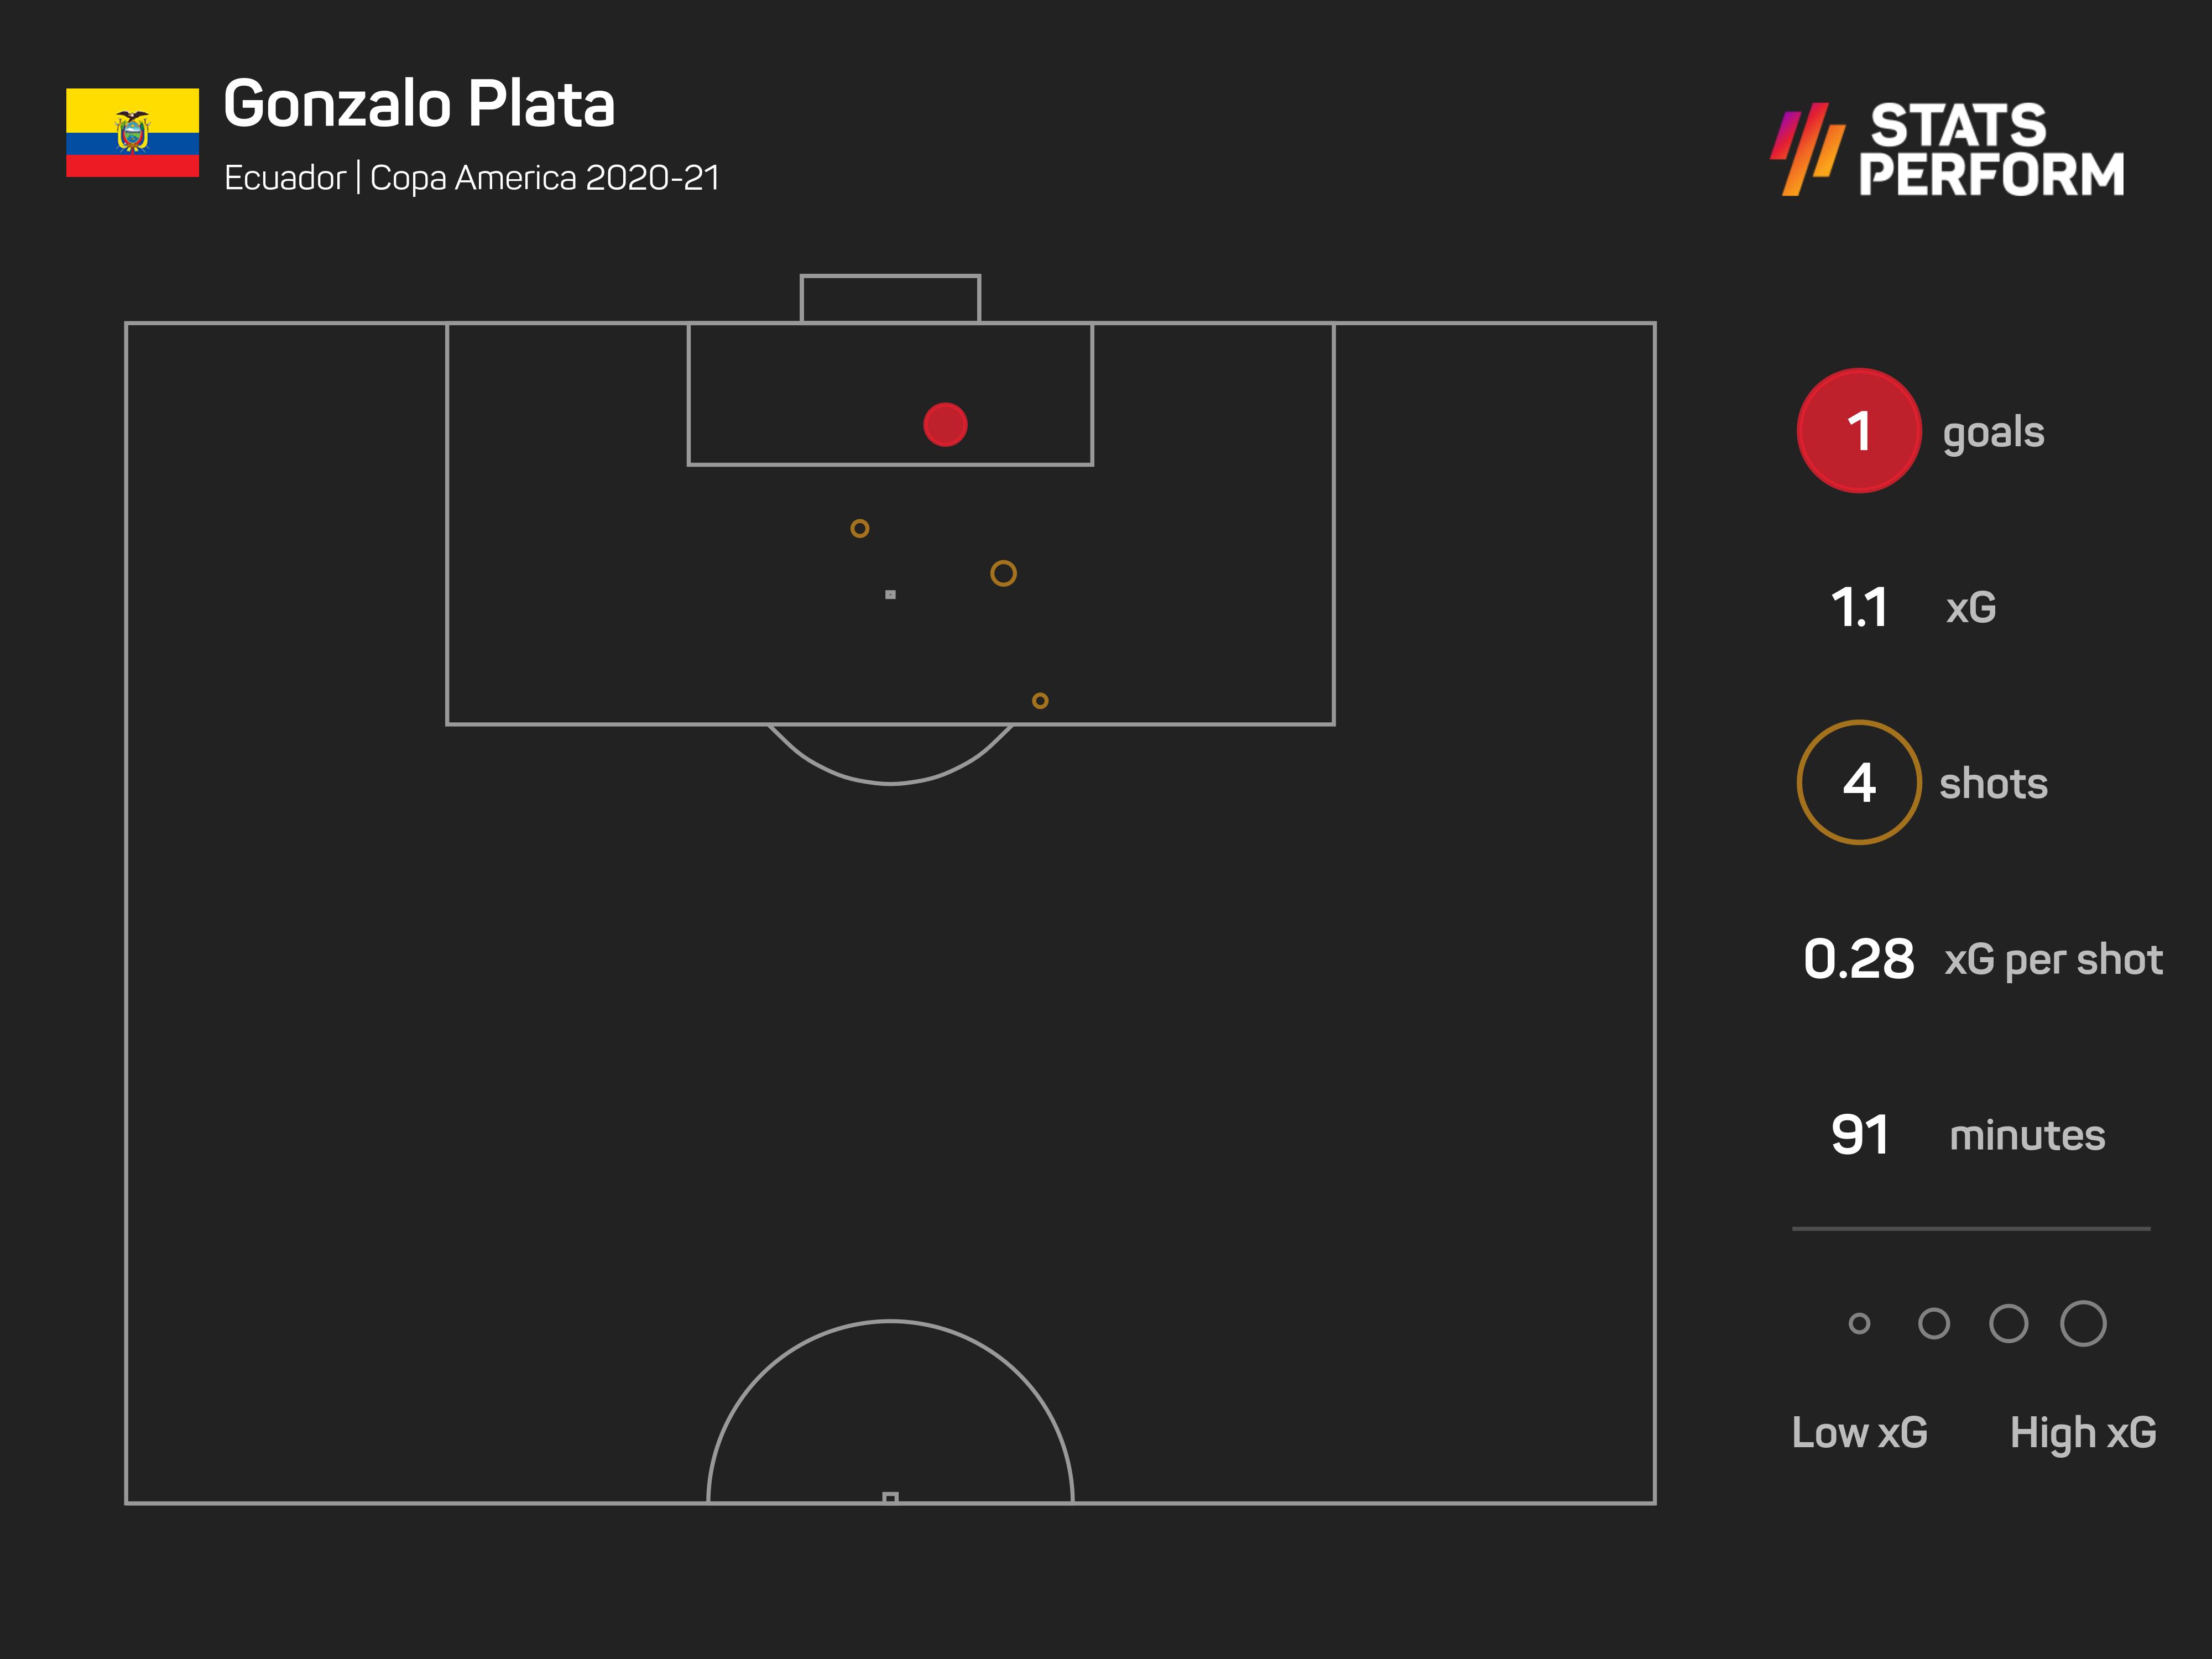 Gonzalo Plata made history against Venezuela